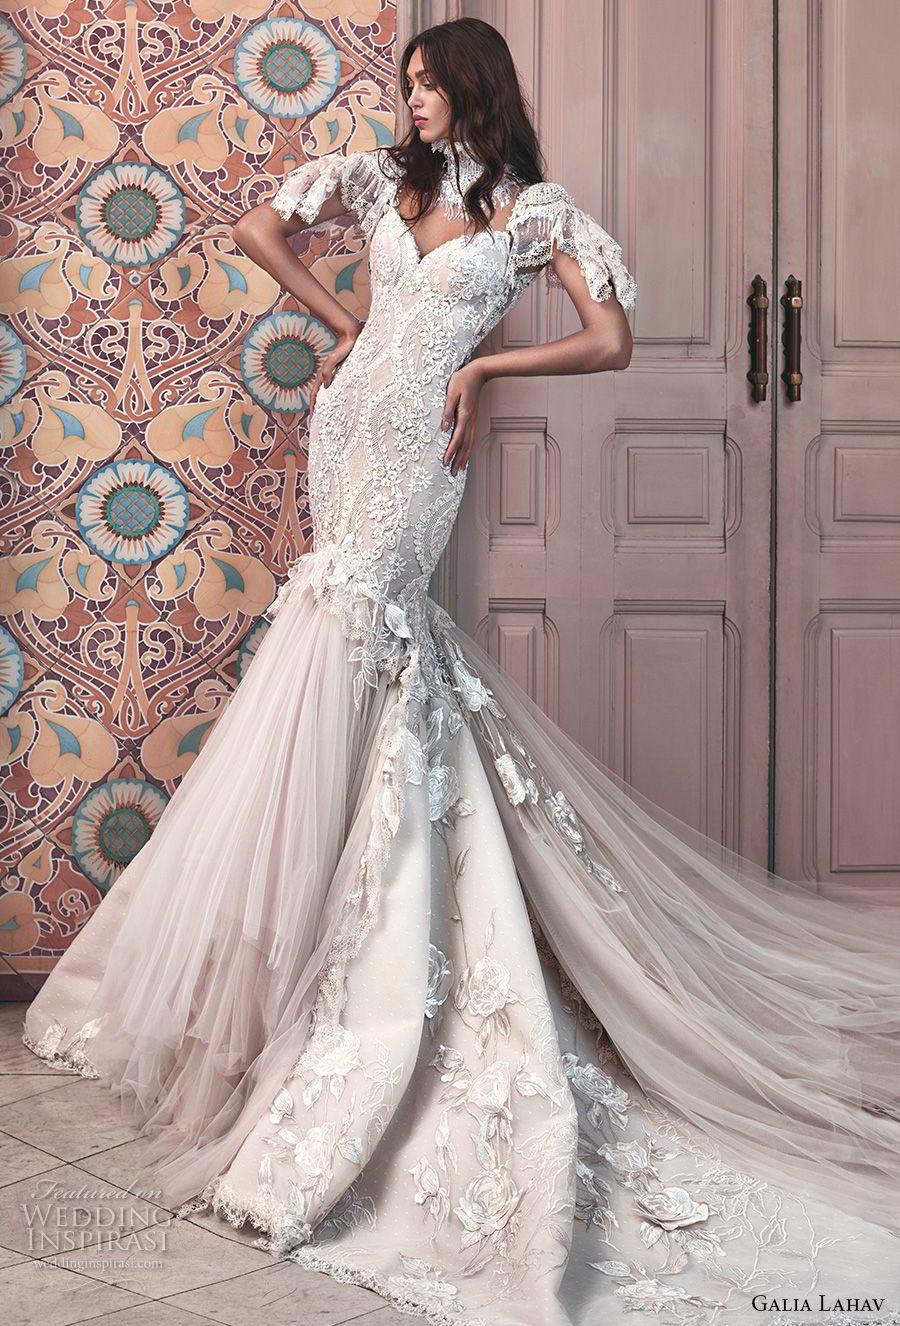 galia lahav spring 2018 bridal short sleeves illusion high sweetheart neck heavily embellished bodice tulle skirt ivory color mermaid wedding dress open low back royal train (ms genesis) mv